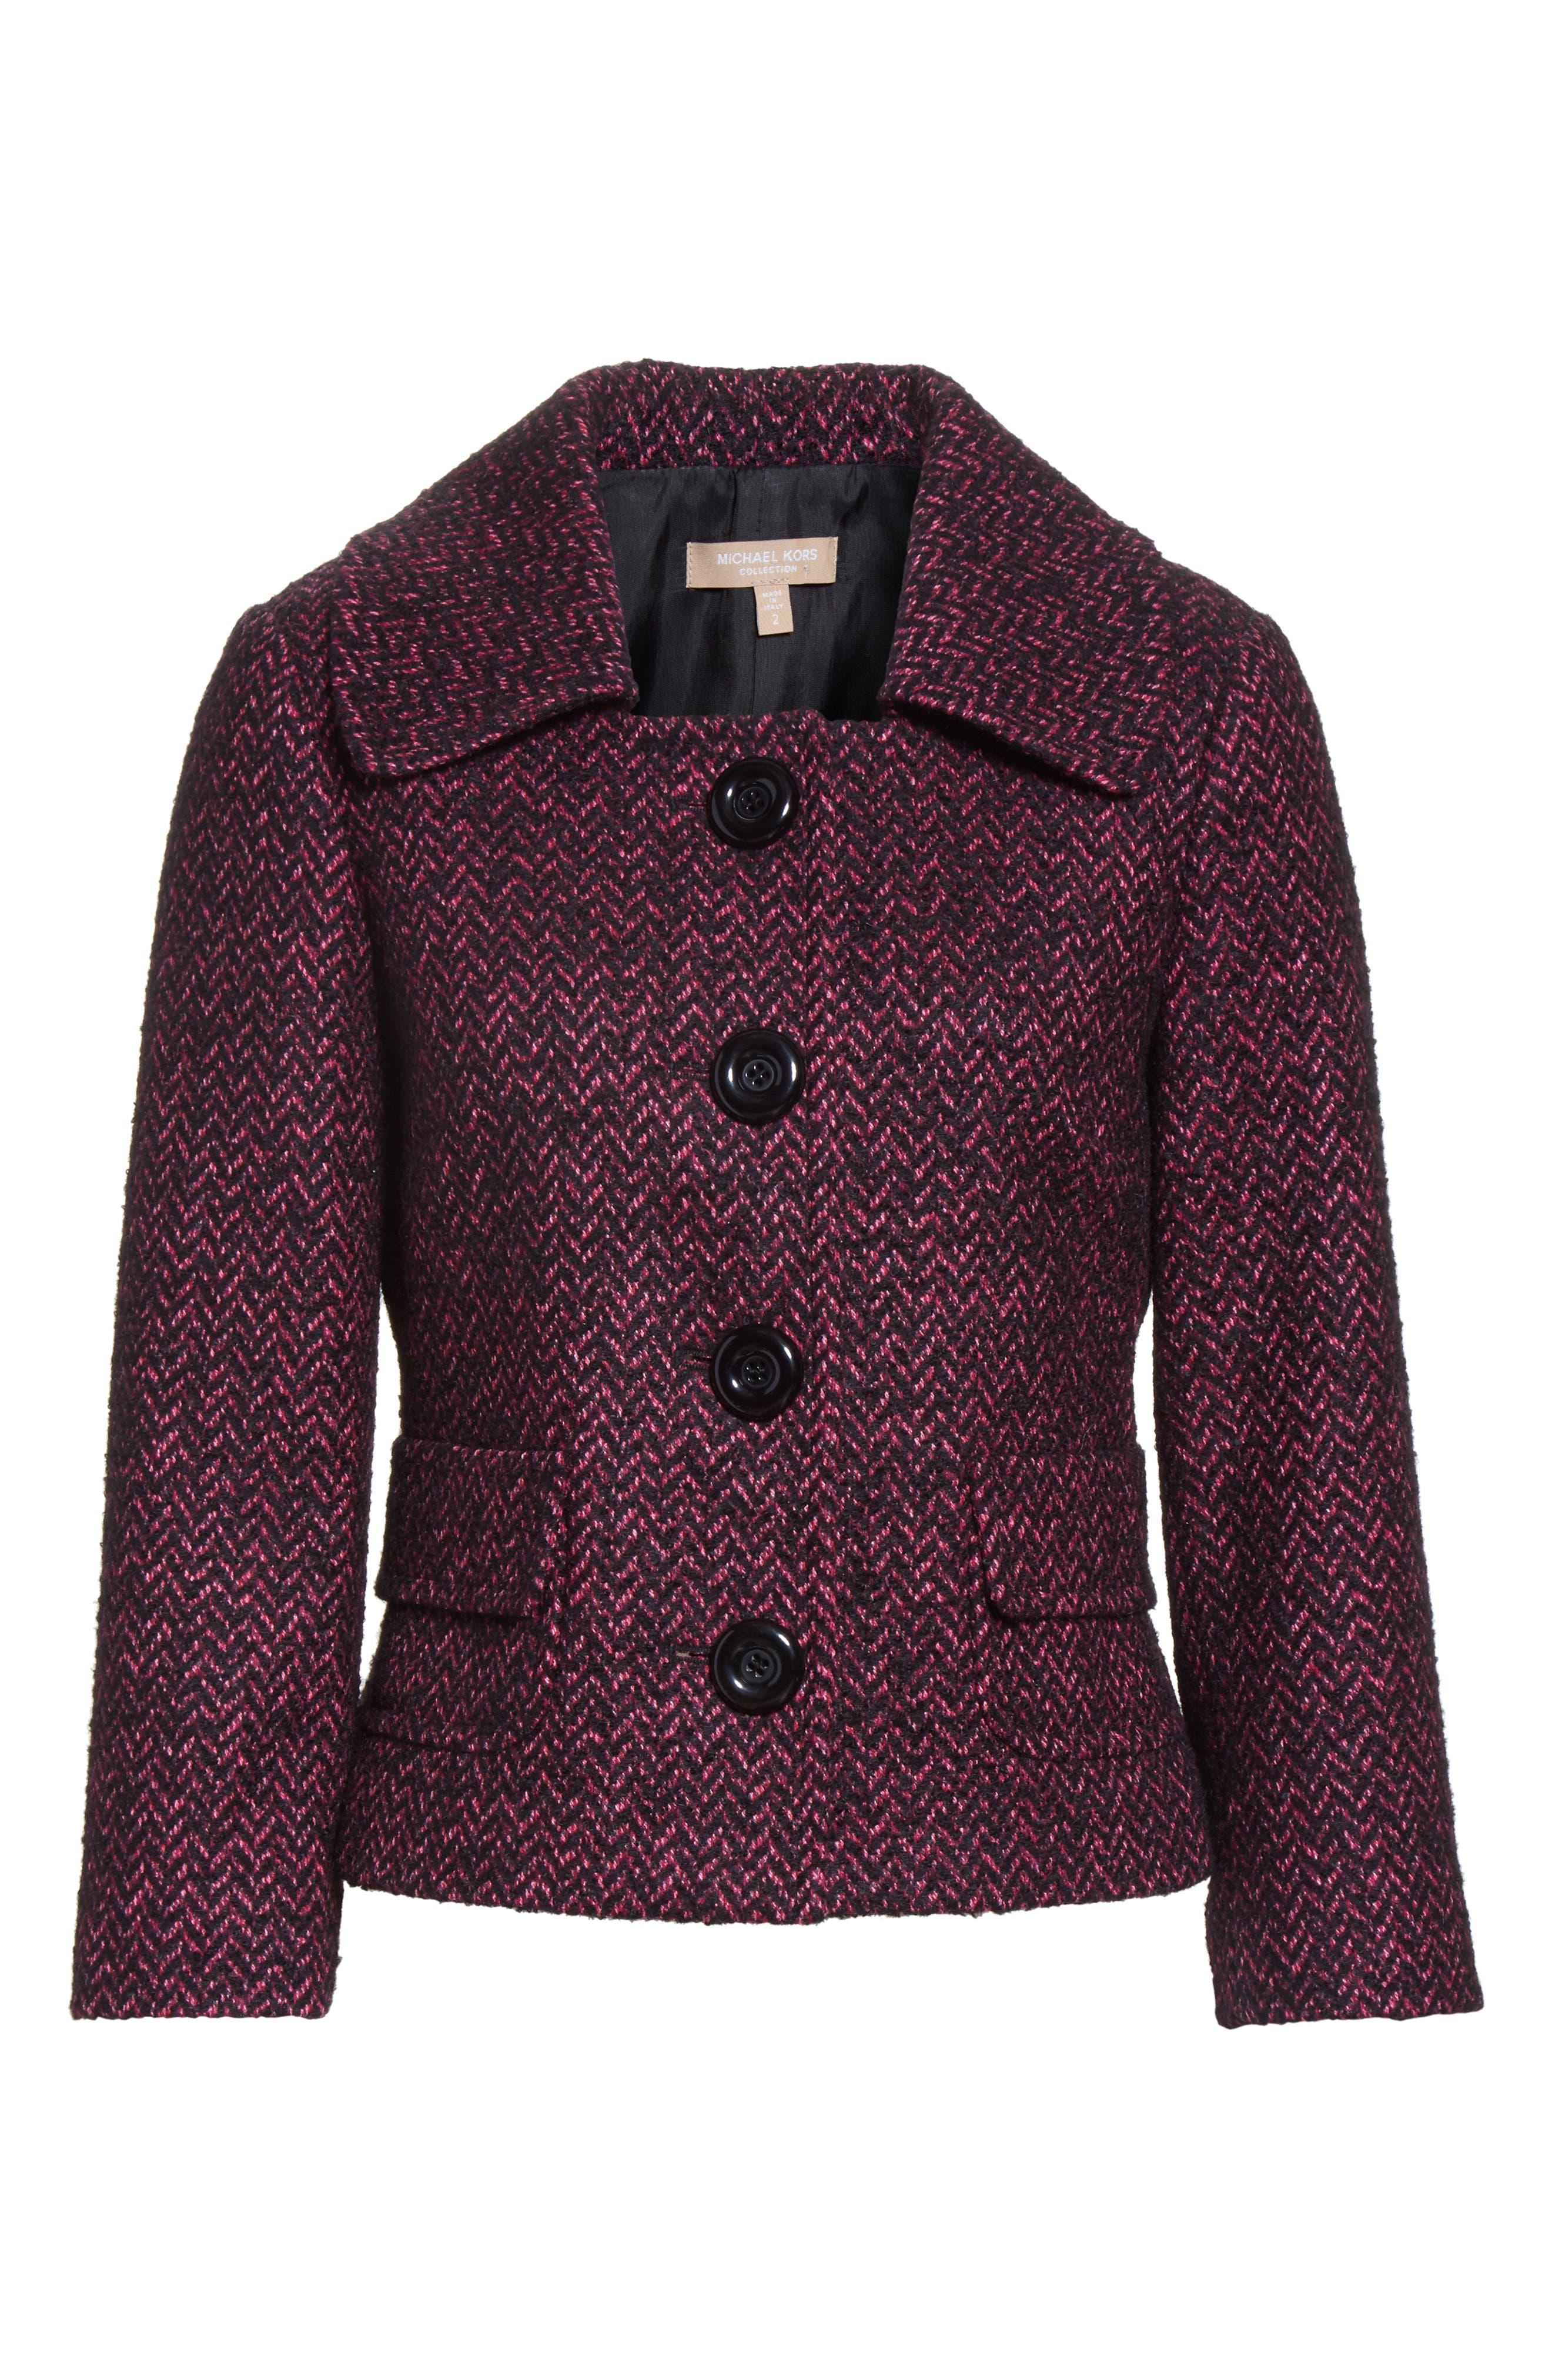 Herringbone Wool Blend Jacket,                             Alternate thumbnail 6, color,                             Magnolia/ Black